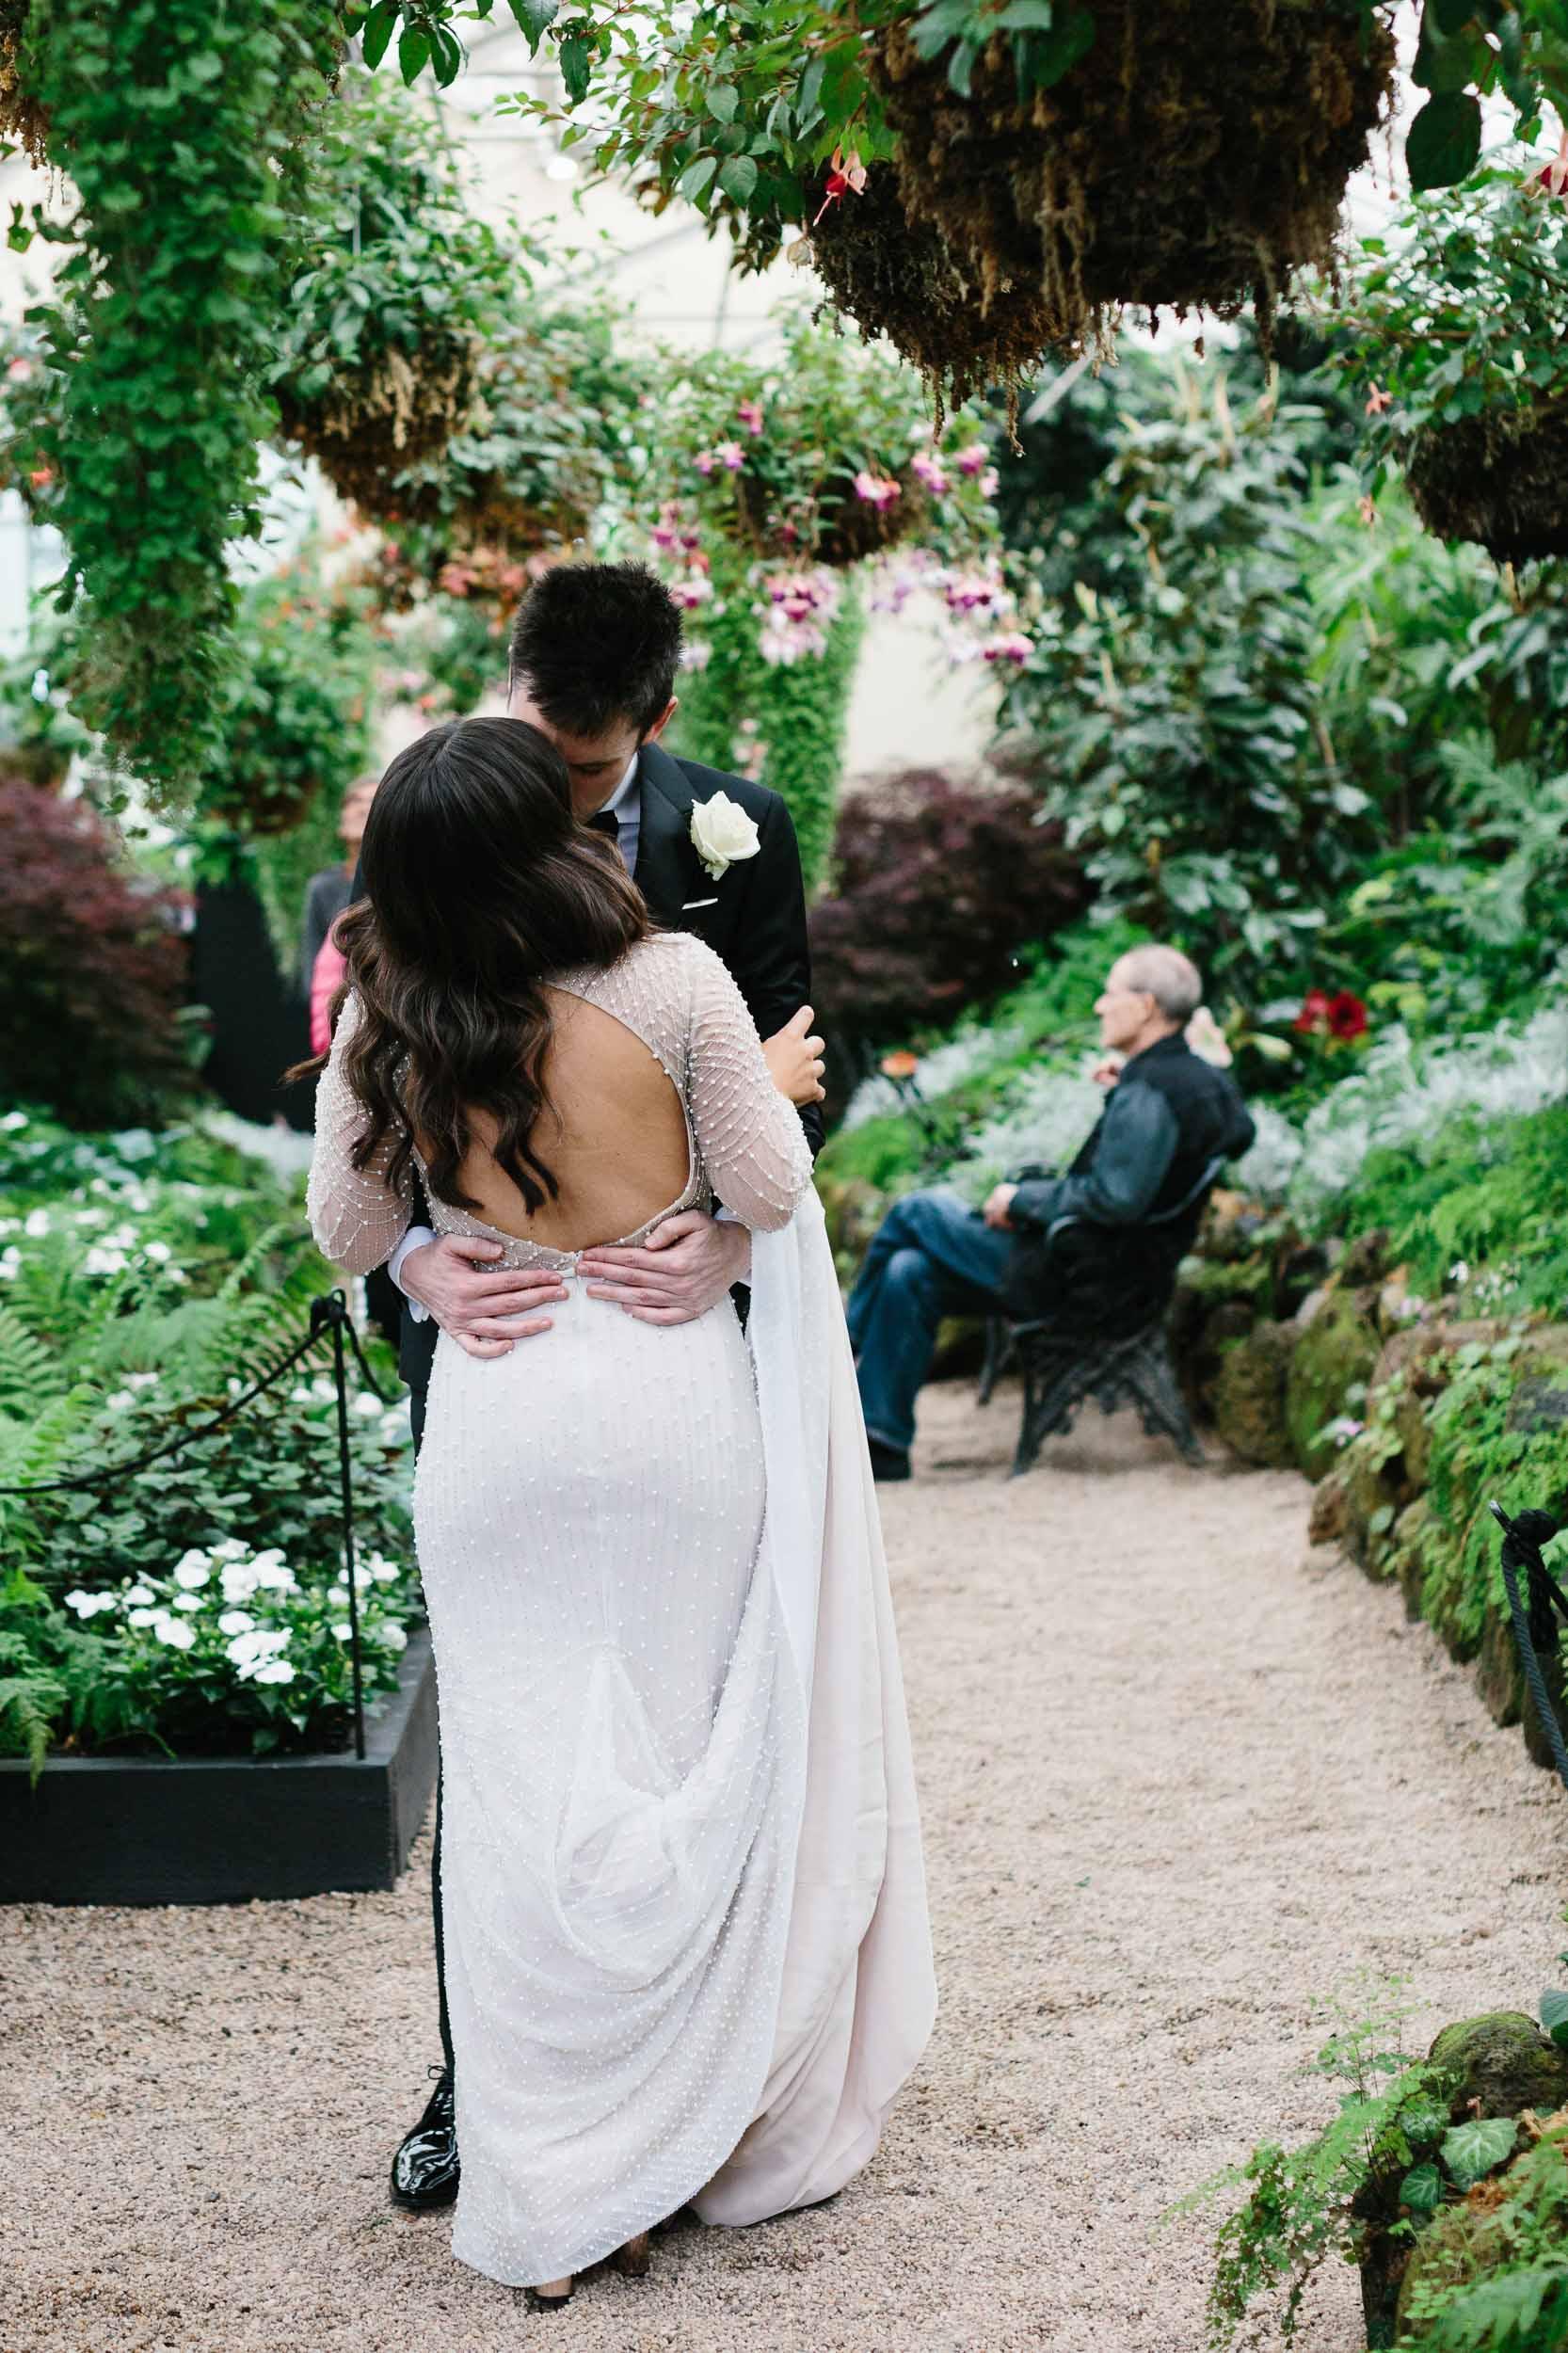 Kas-Richards-Wedding-Photographer-Melbourne-City-Wedding-Alto-Event-Space-Jane-Hill-Bridal-Gown-3.jpg